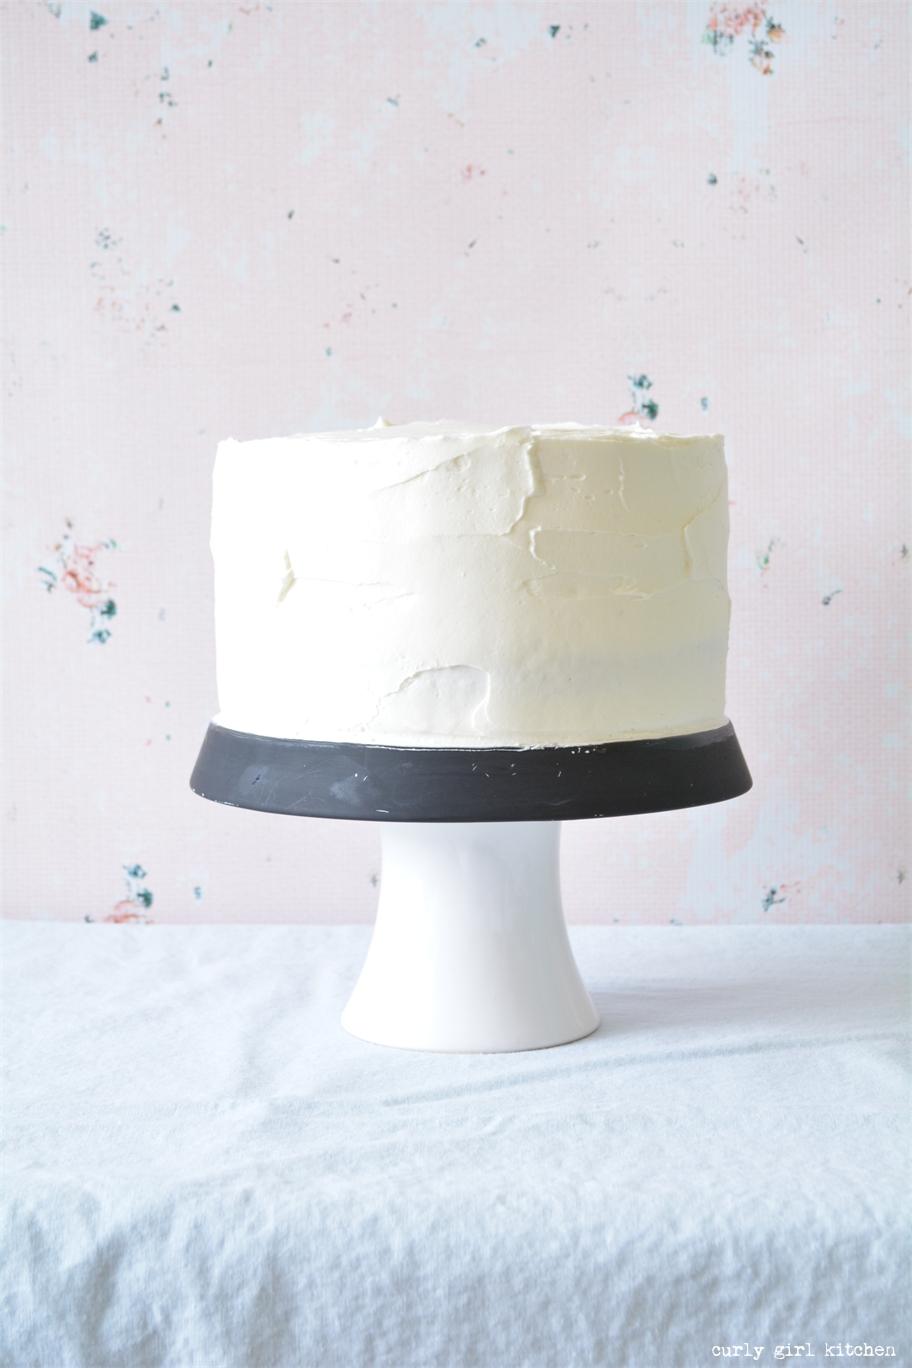 Curly Girl Kitchen: Just a Vanilla Cake Recipe